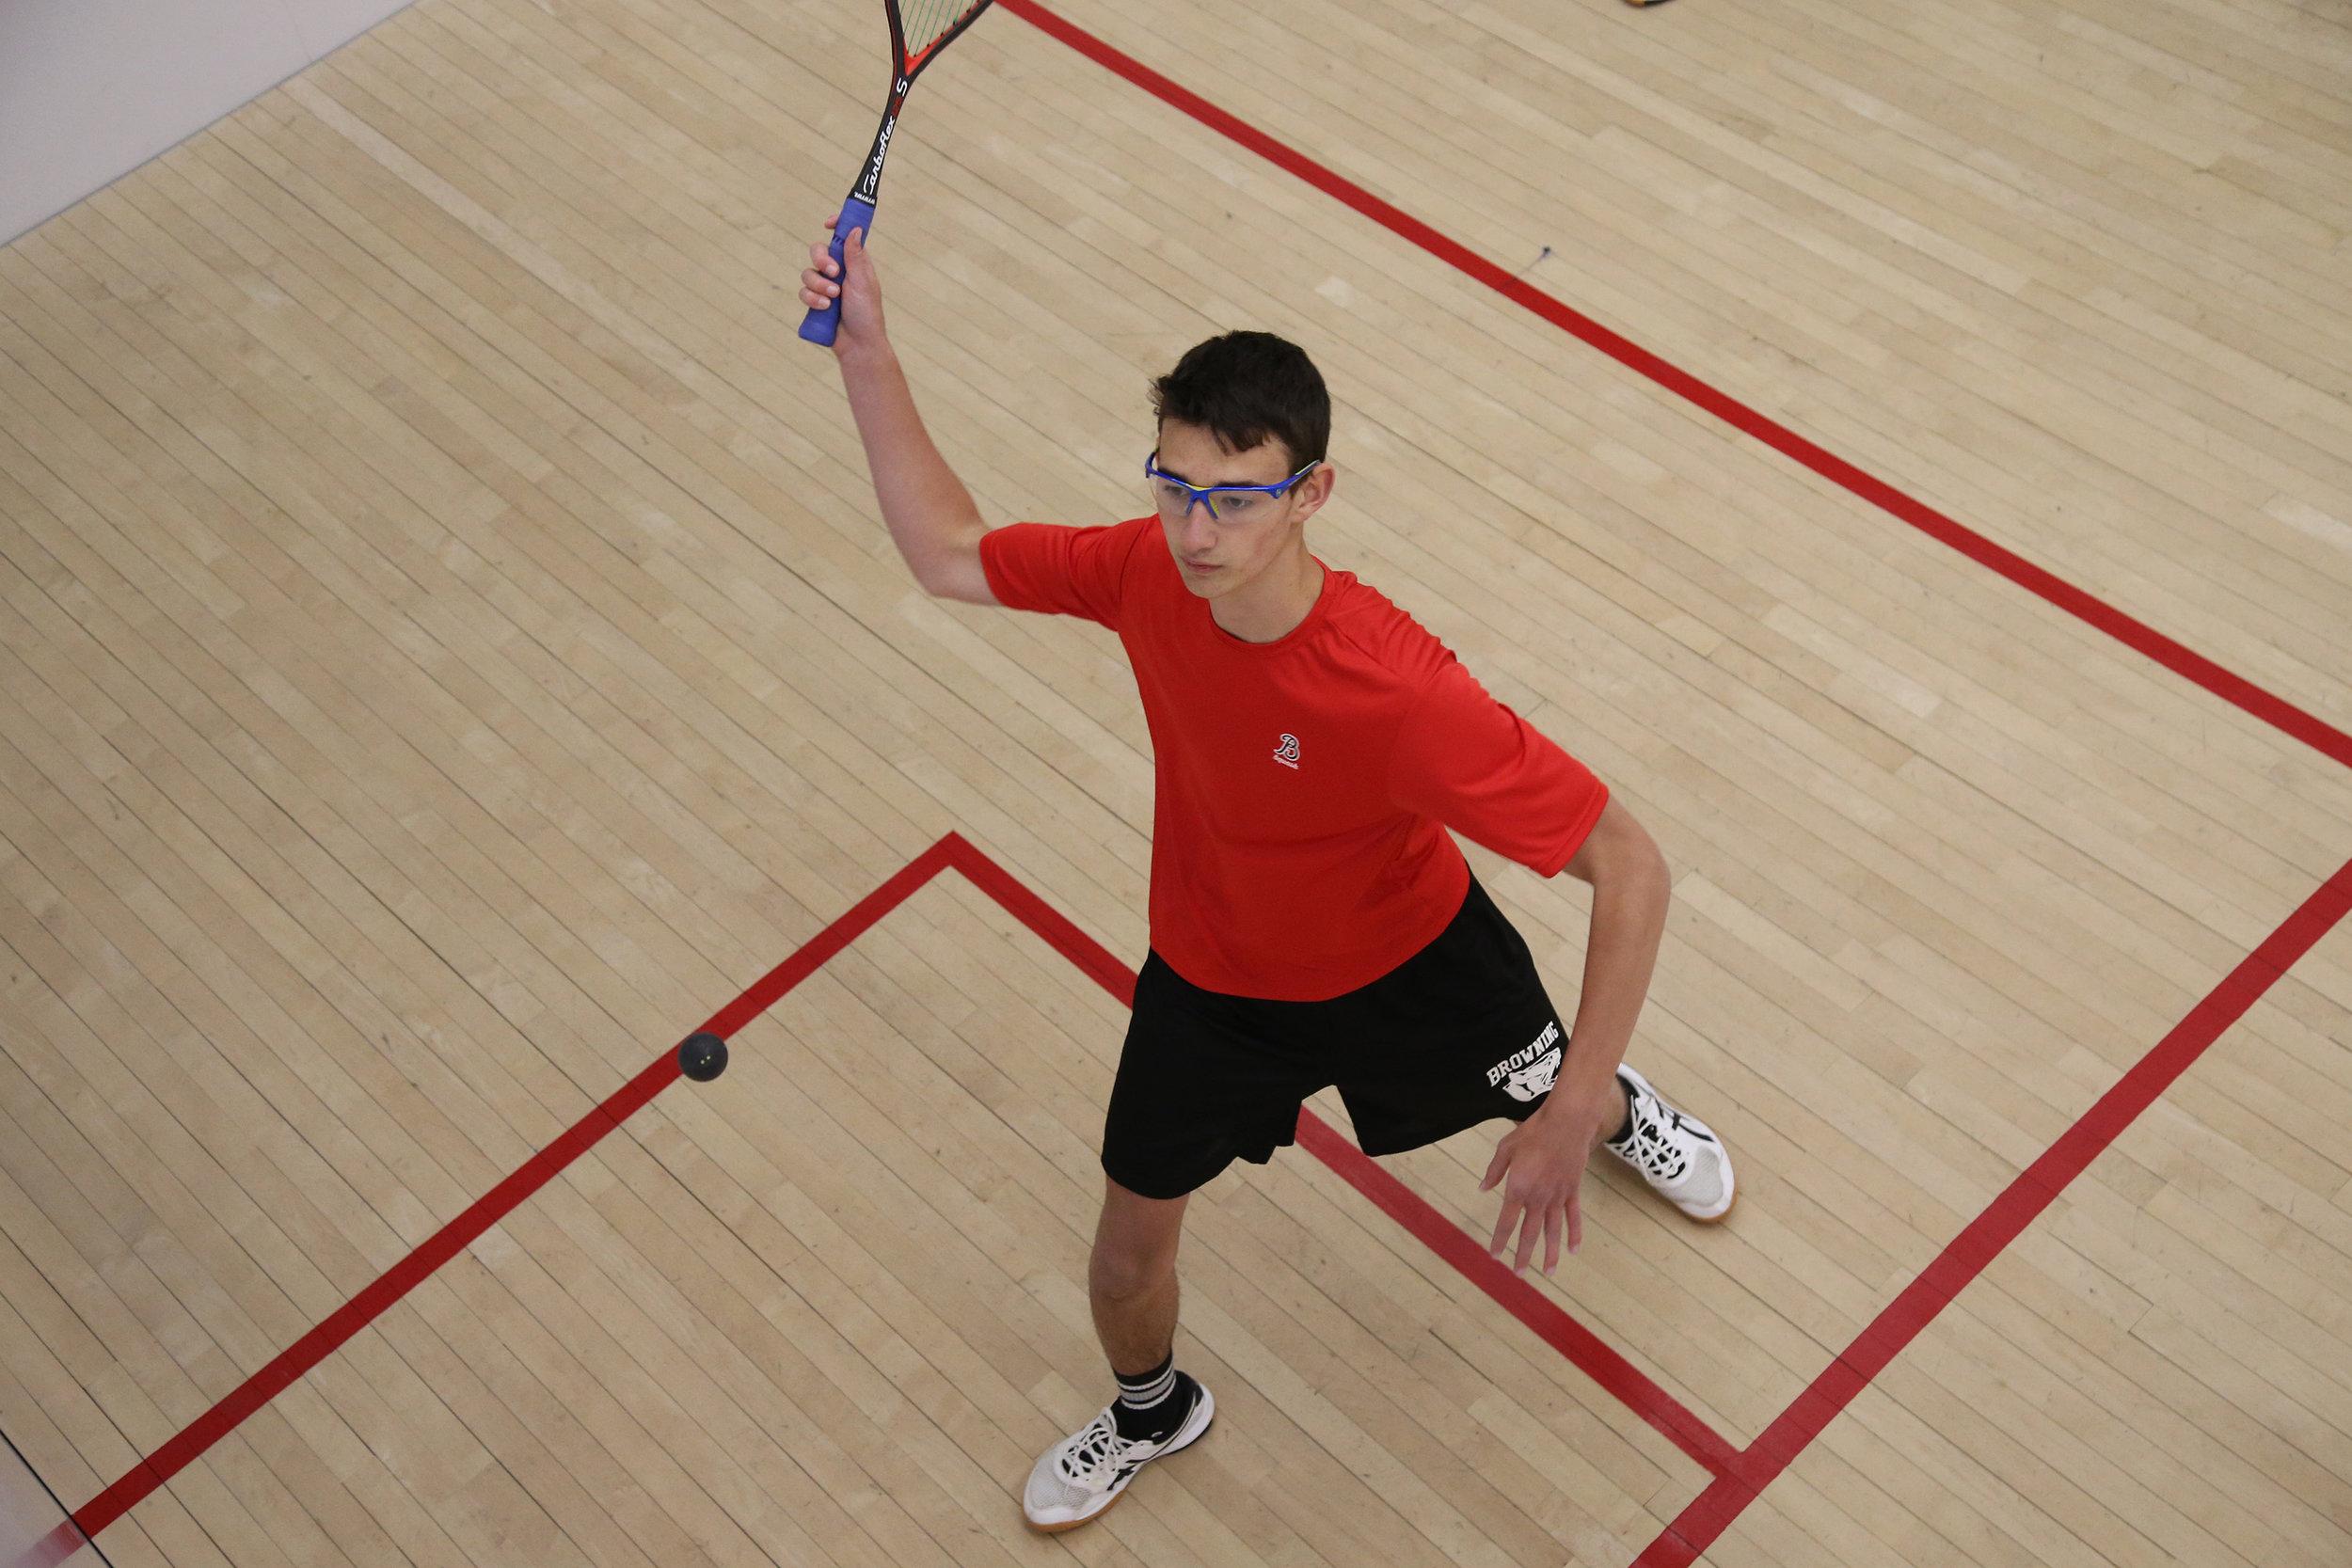 Browning Squash 011419-Al Pereira (151).JPG